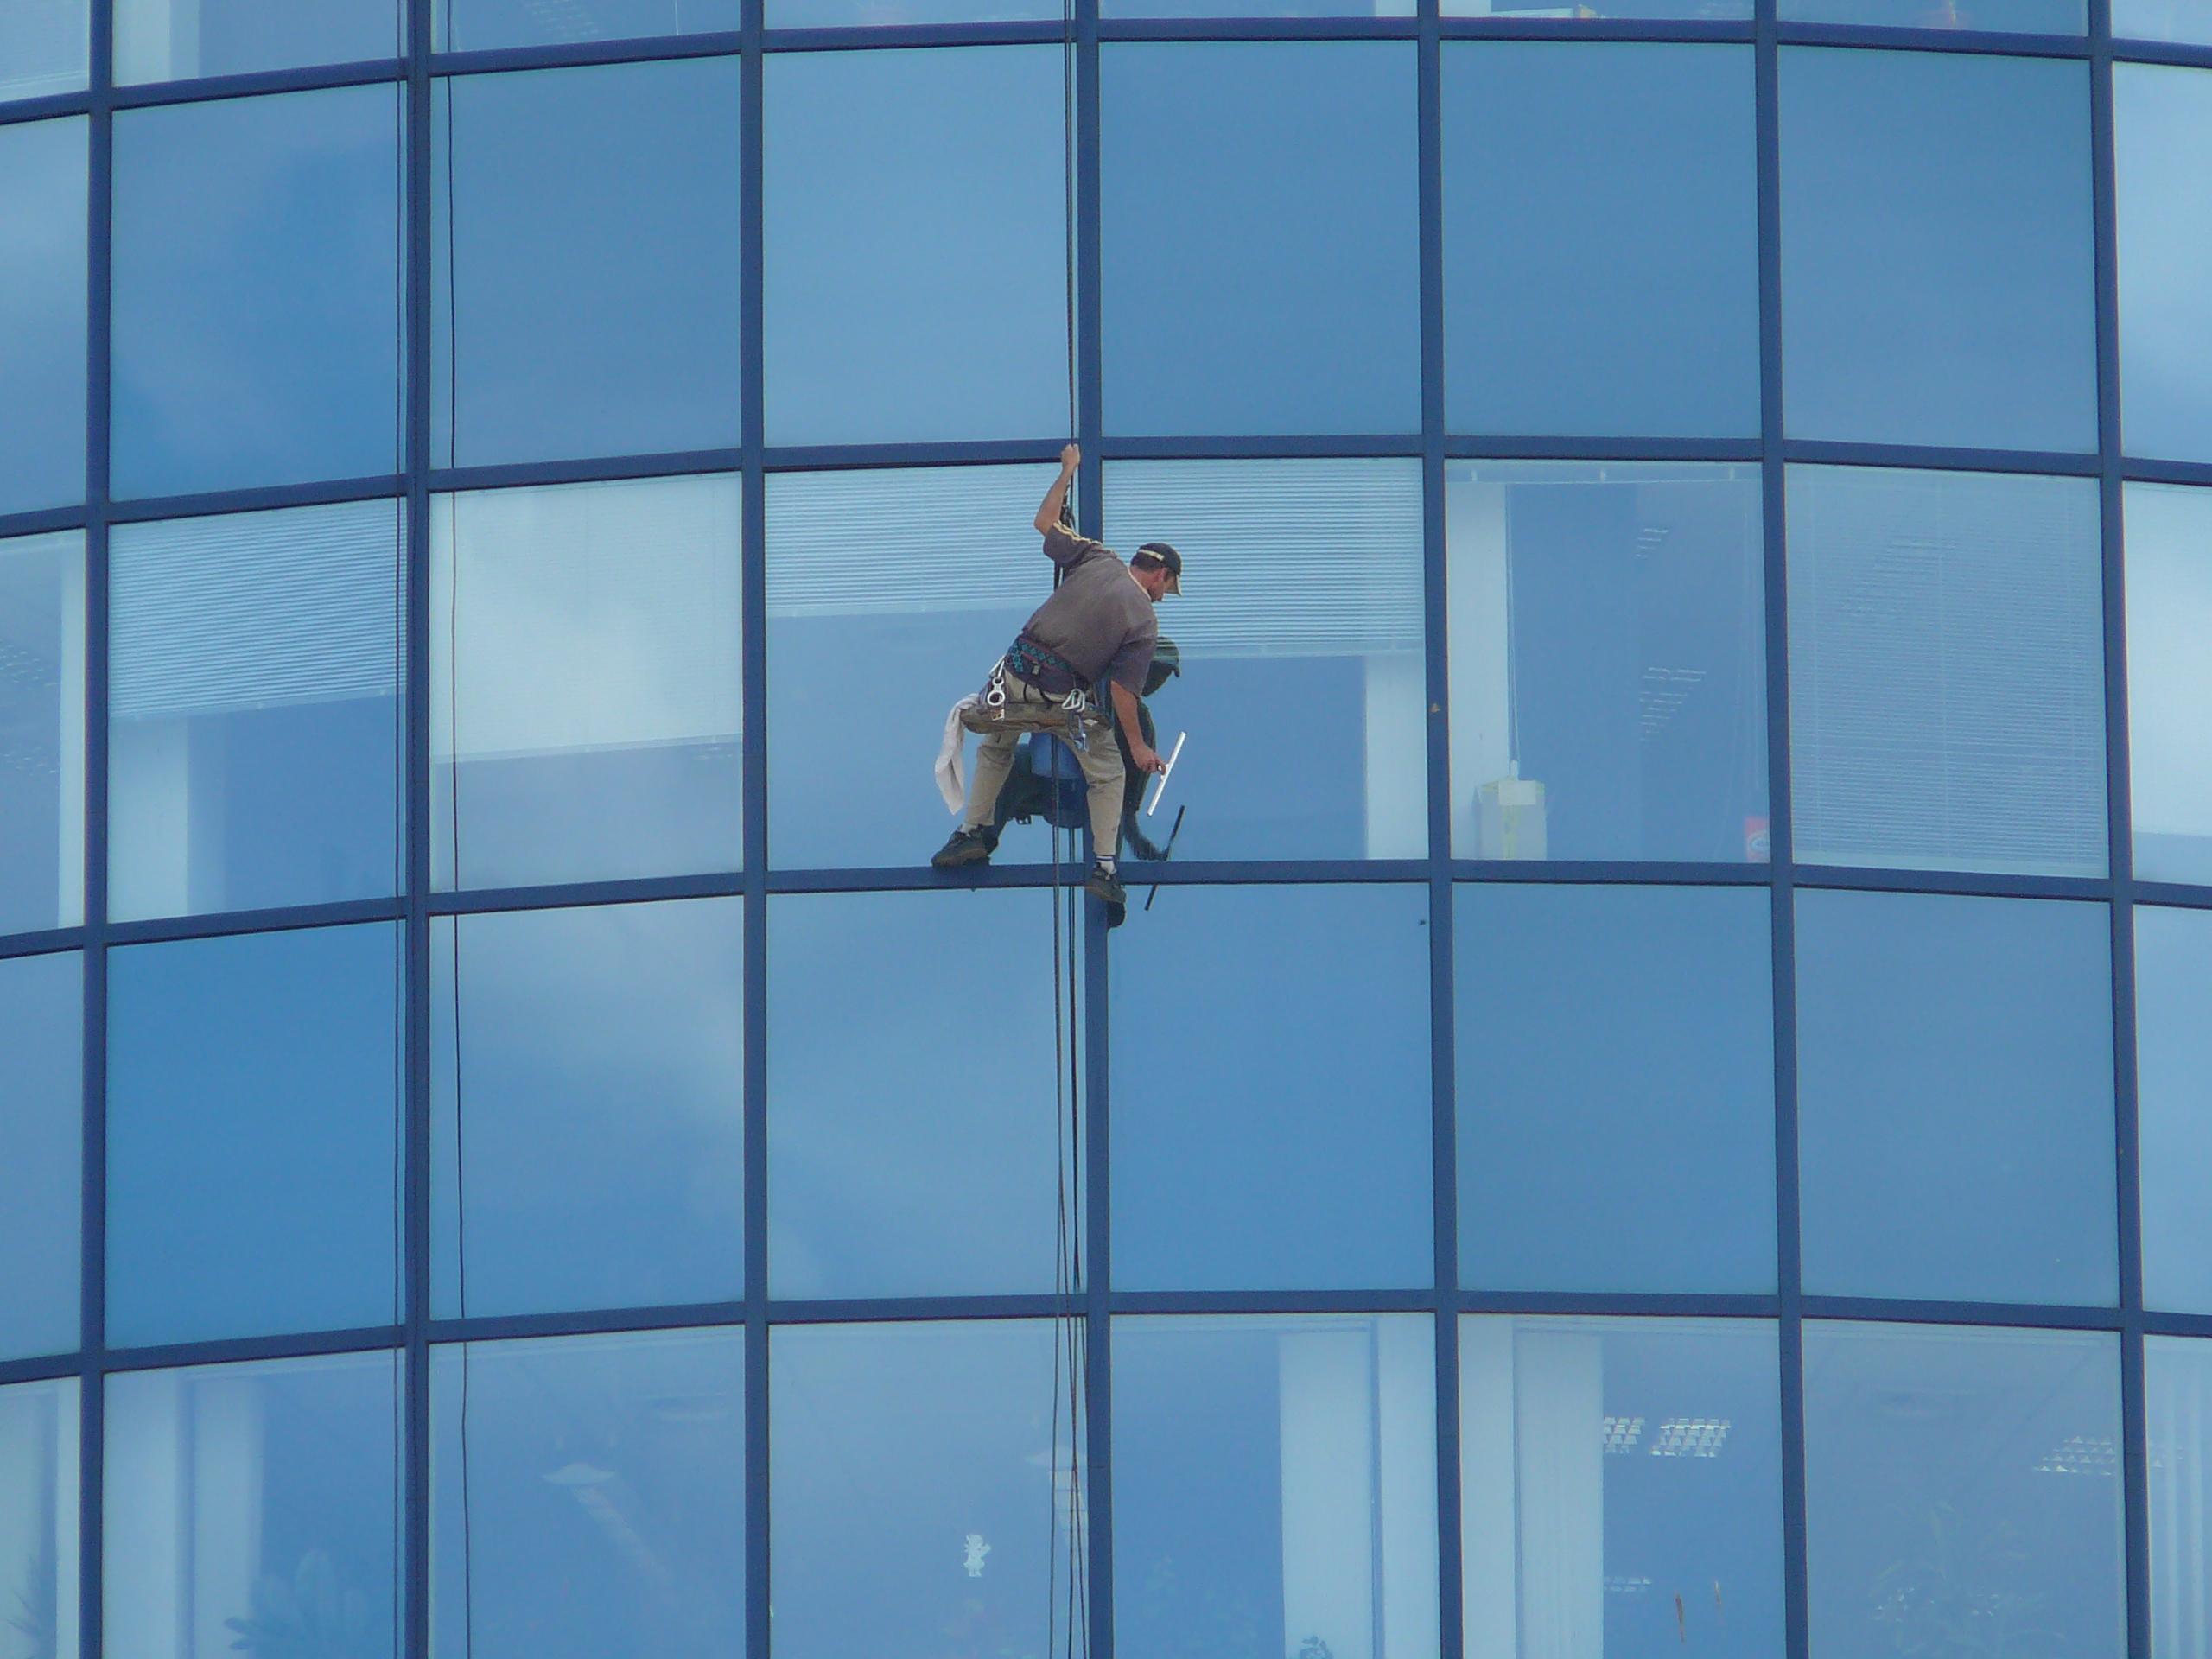 File:Window cleaner, M-Palác, Brno (2).jpg